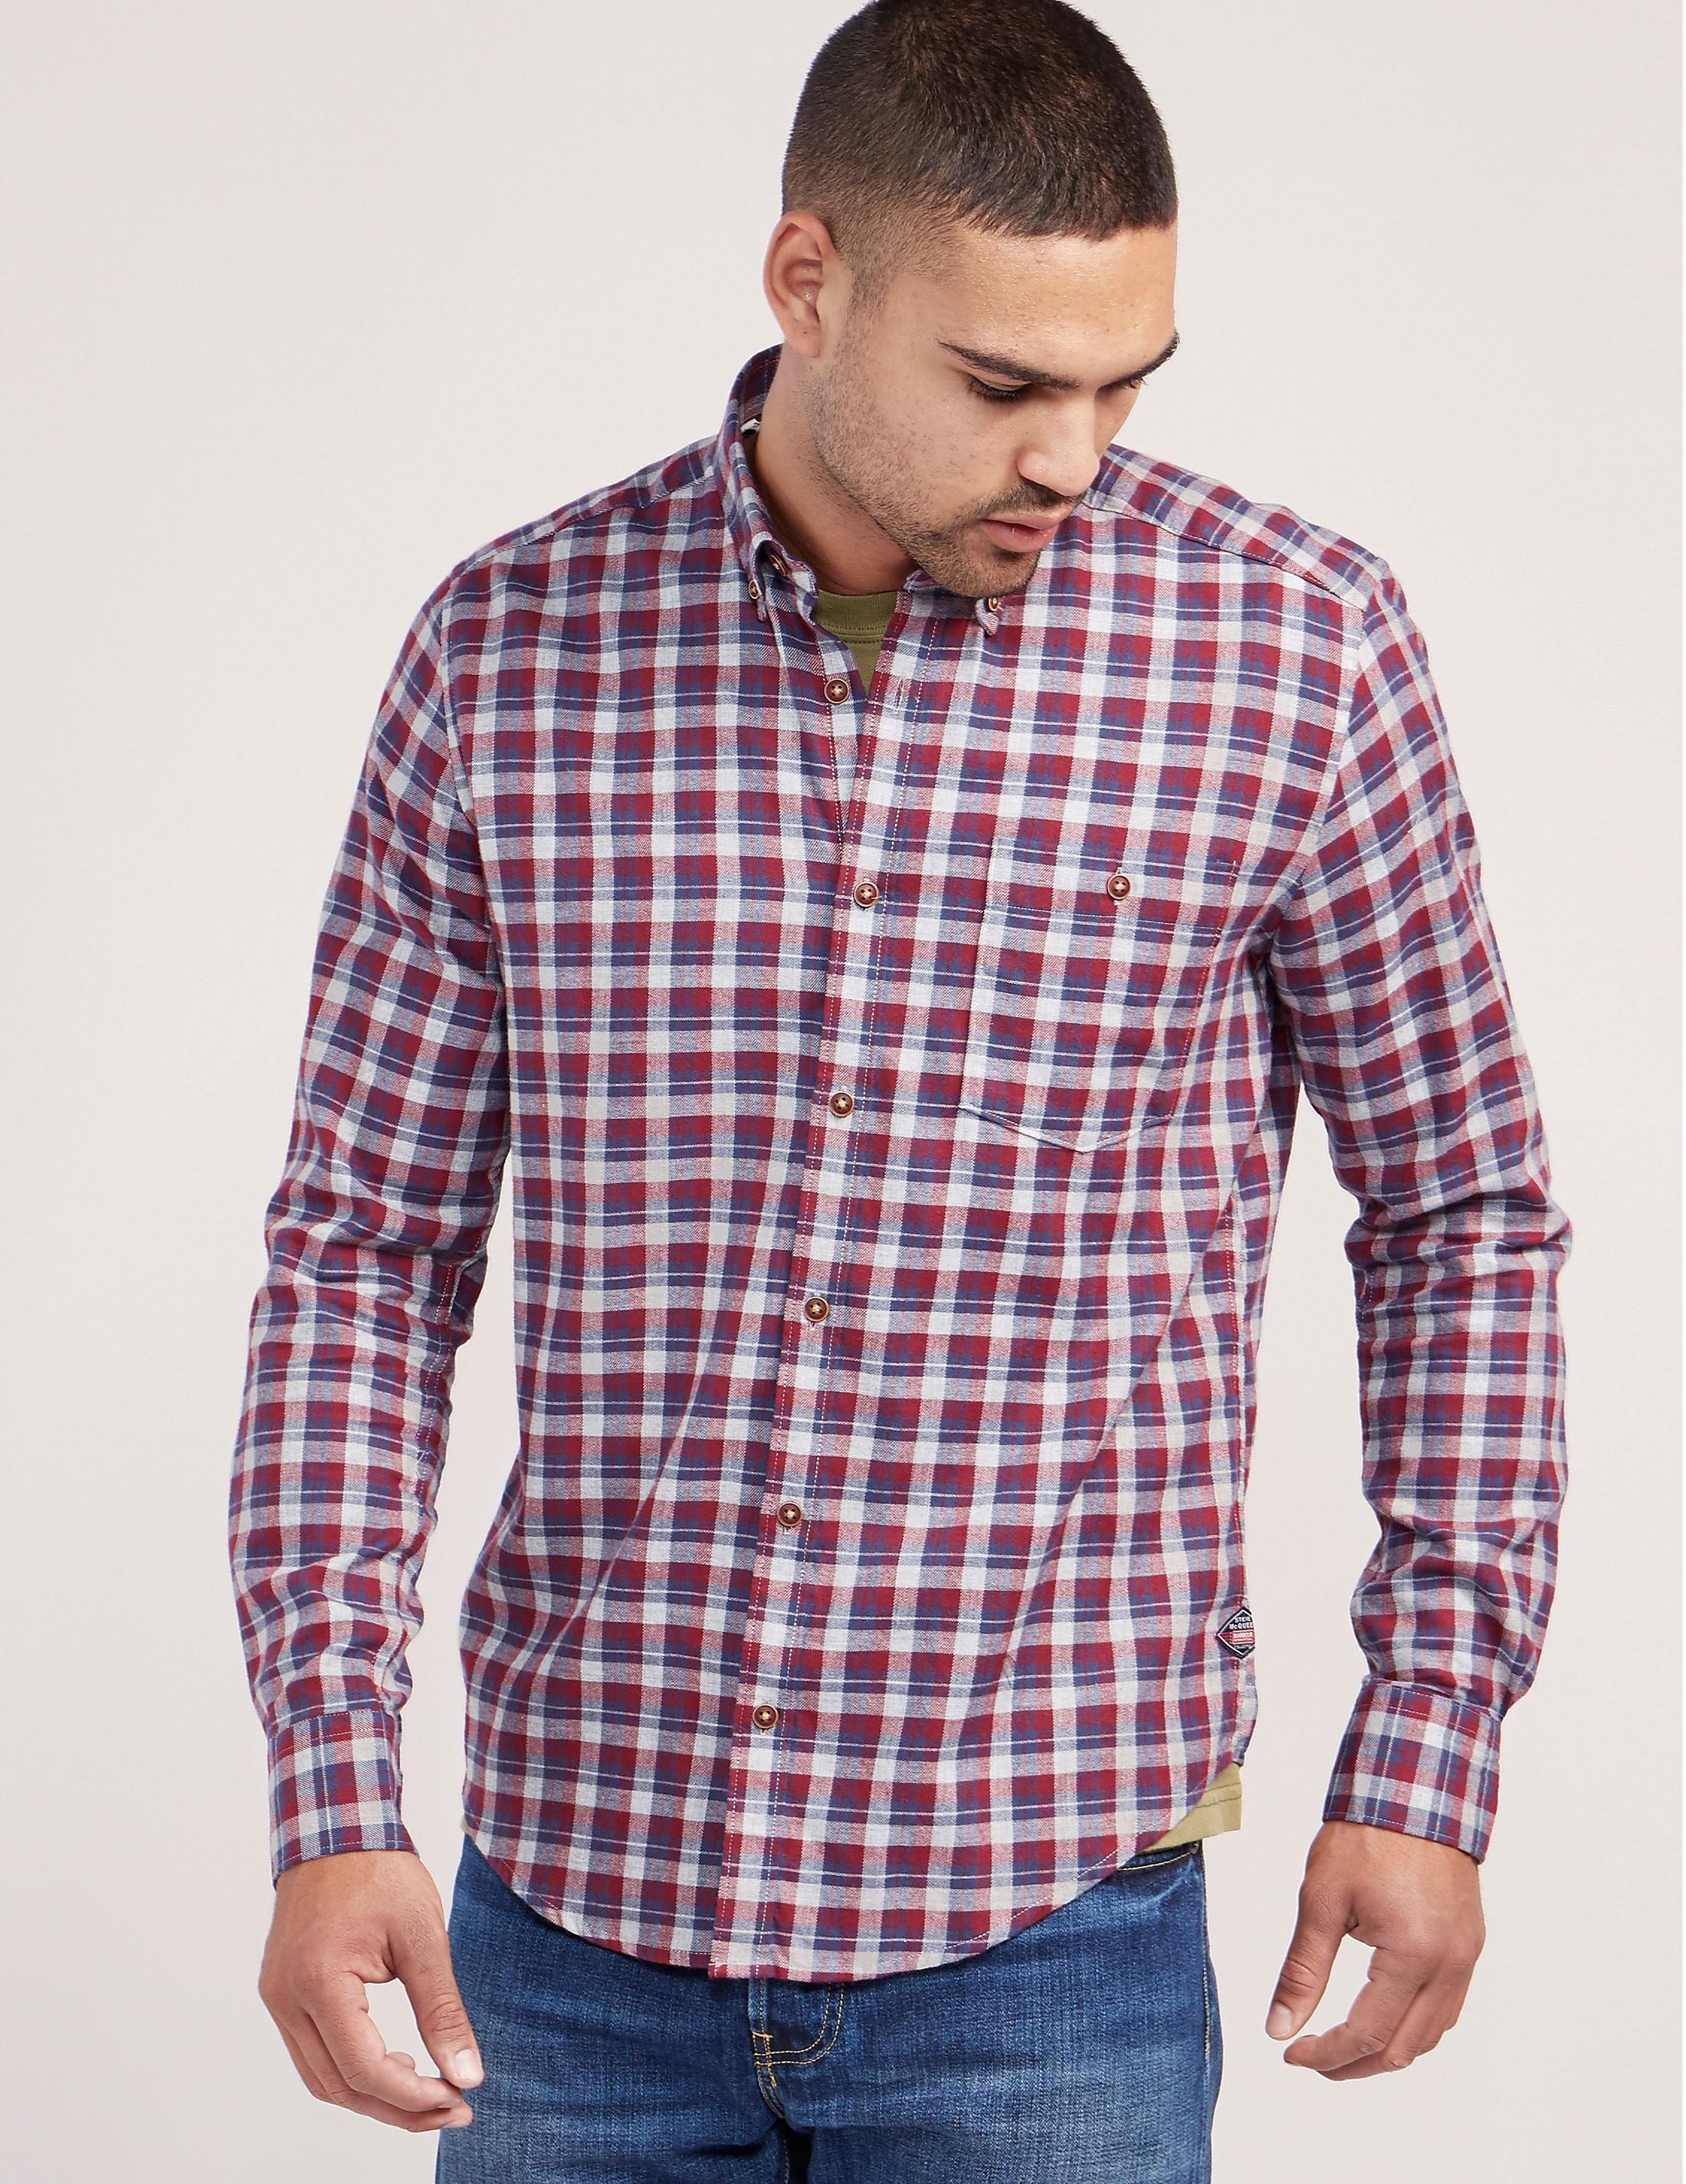 Barbour International Steve McQueen Hero Check Shirt